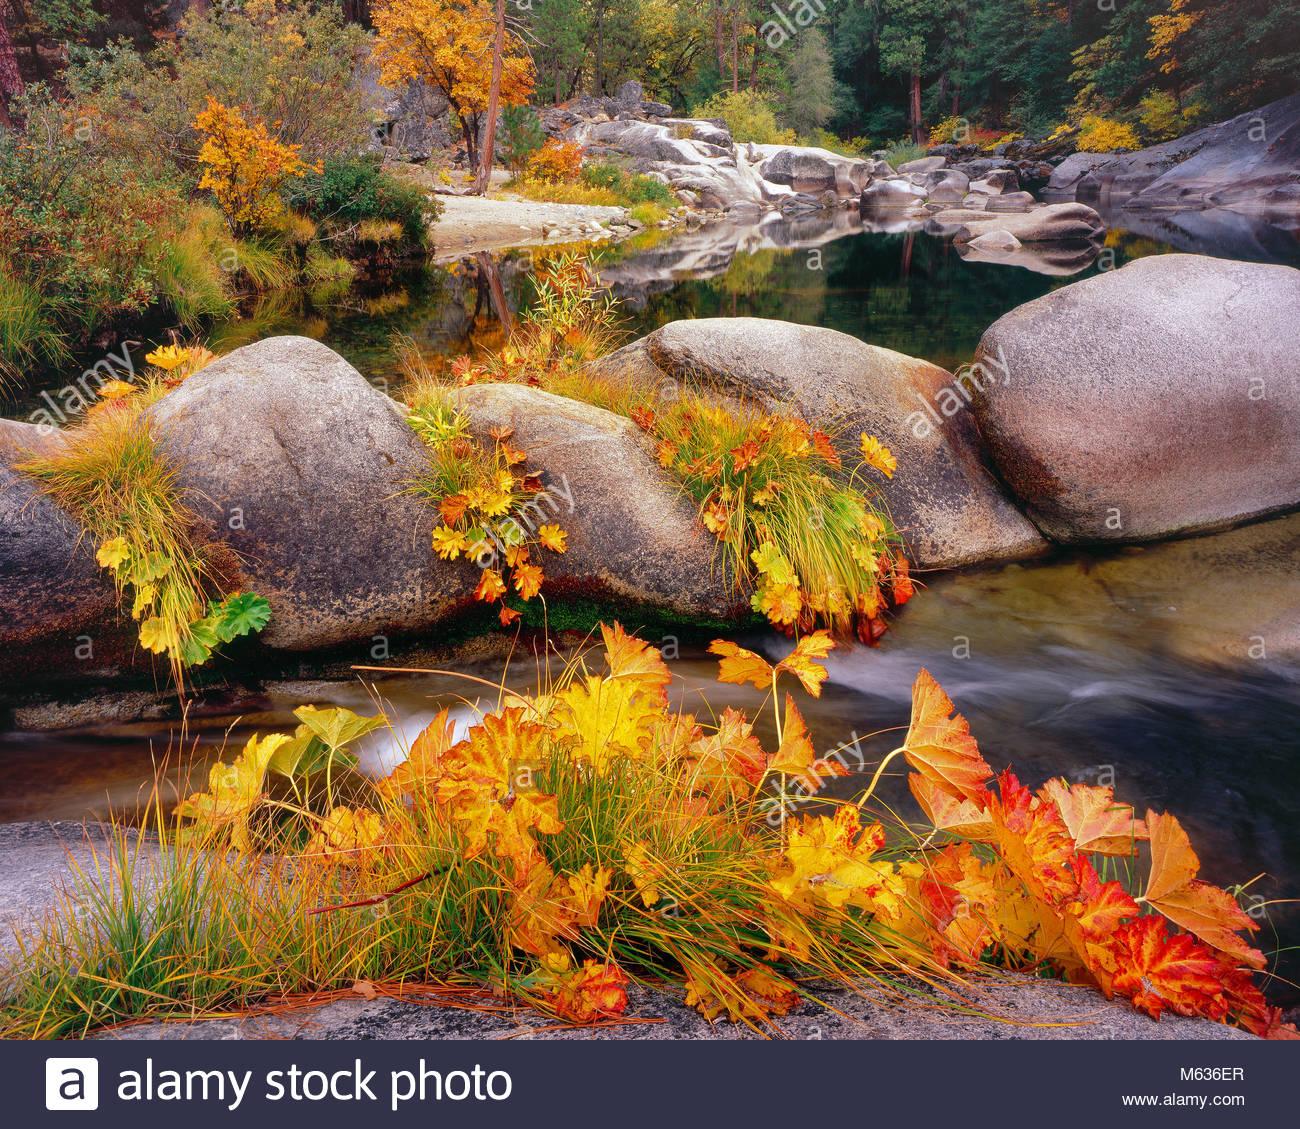 Indische Rhabarber, Darmera peltata, Merced River, Yosemite National Park, Kalifornien Stockbild